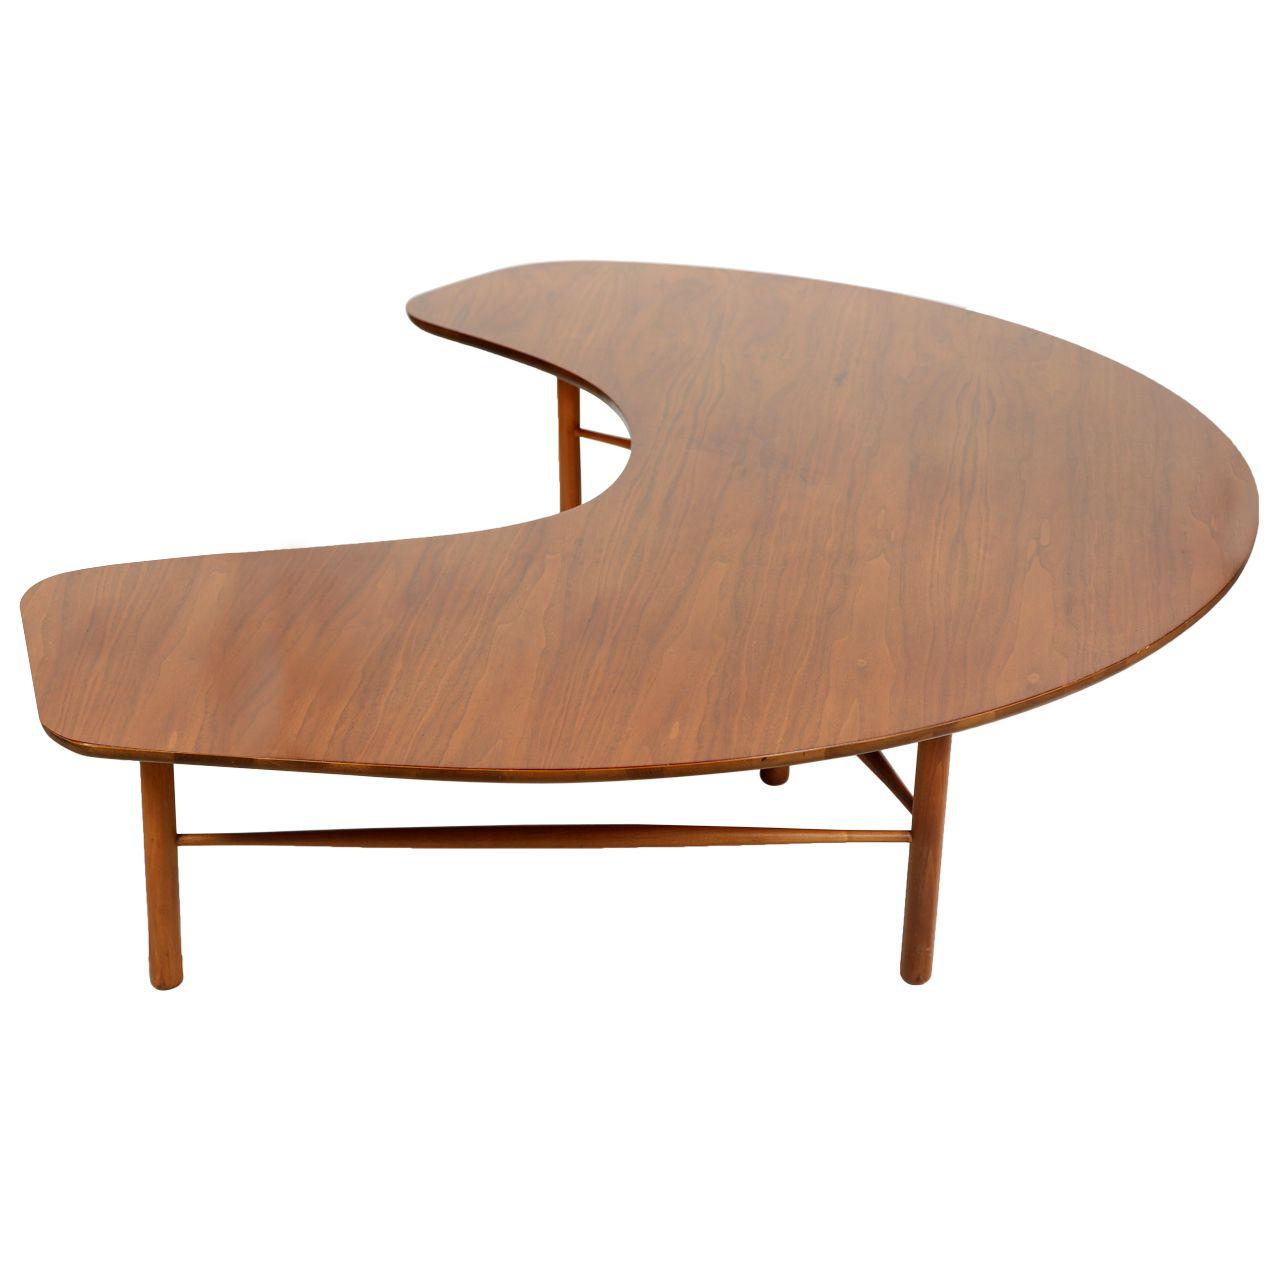 Greta Grossman Crescent Shaped Coffee Table